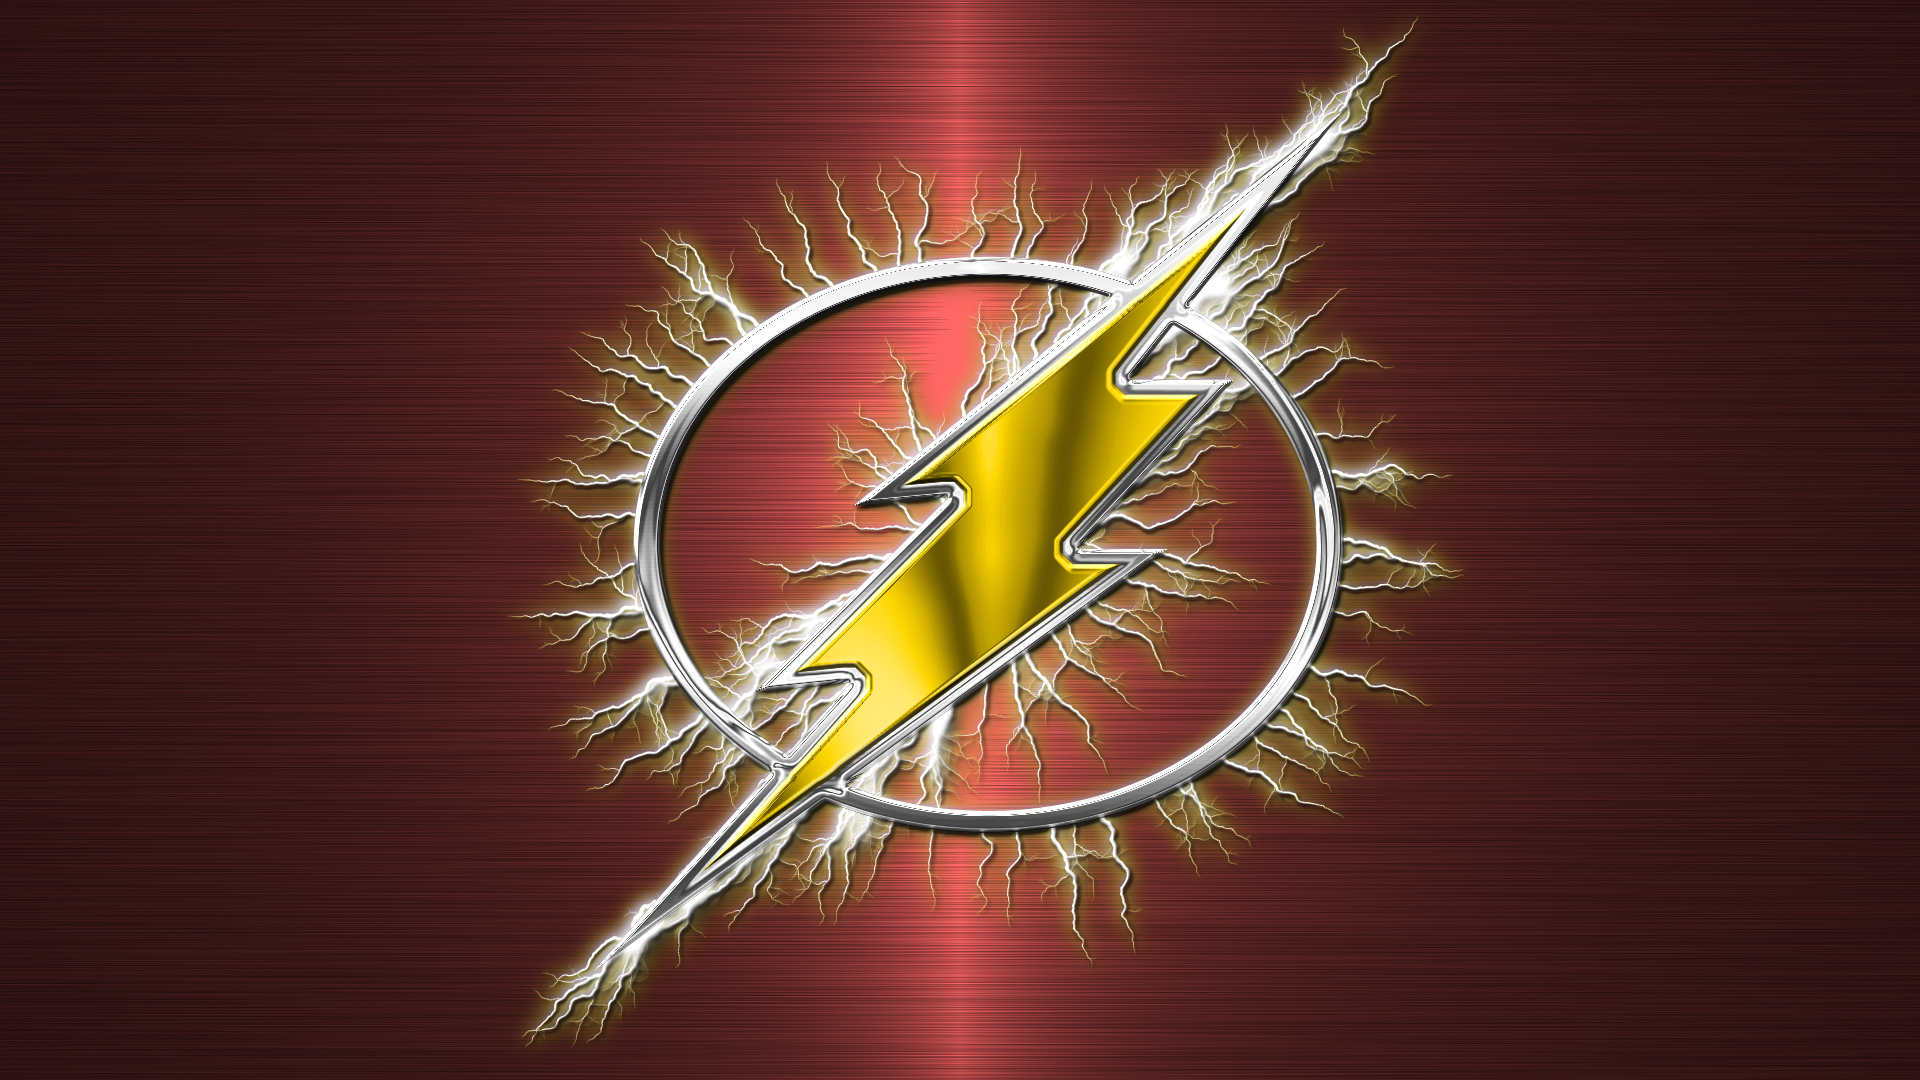 Flash Hd Wallpaper Background Image 1920x1080 Id 479274